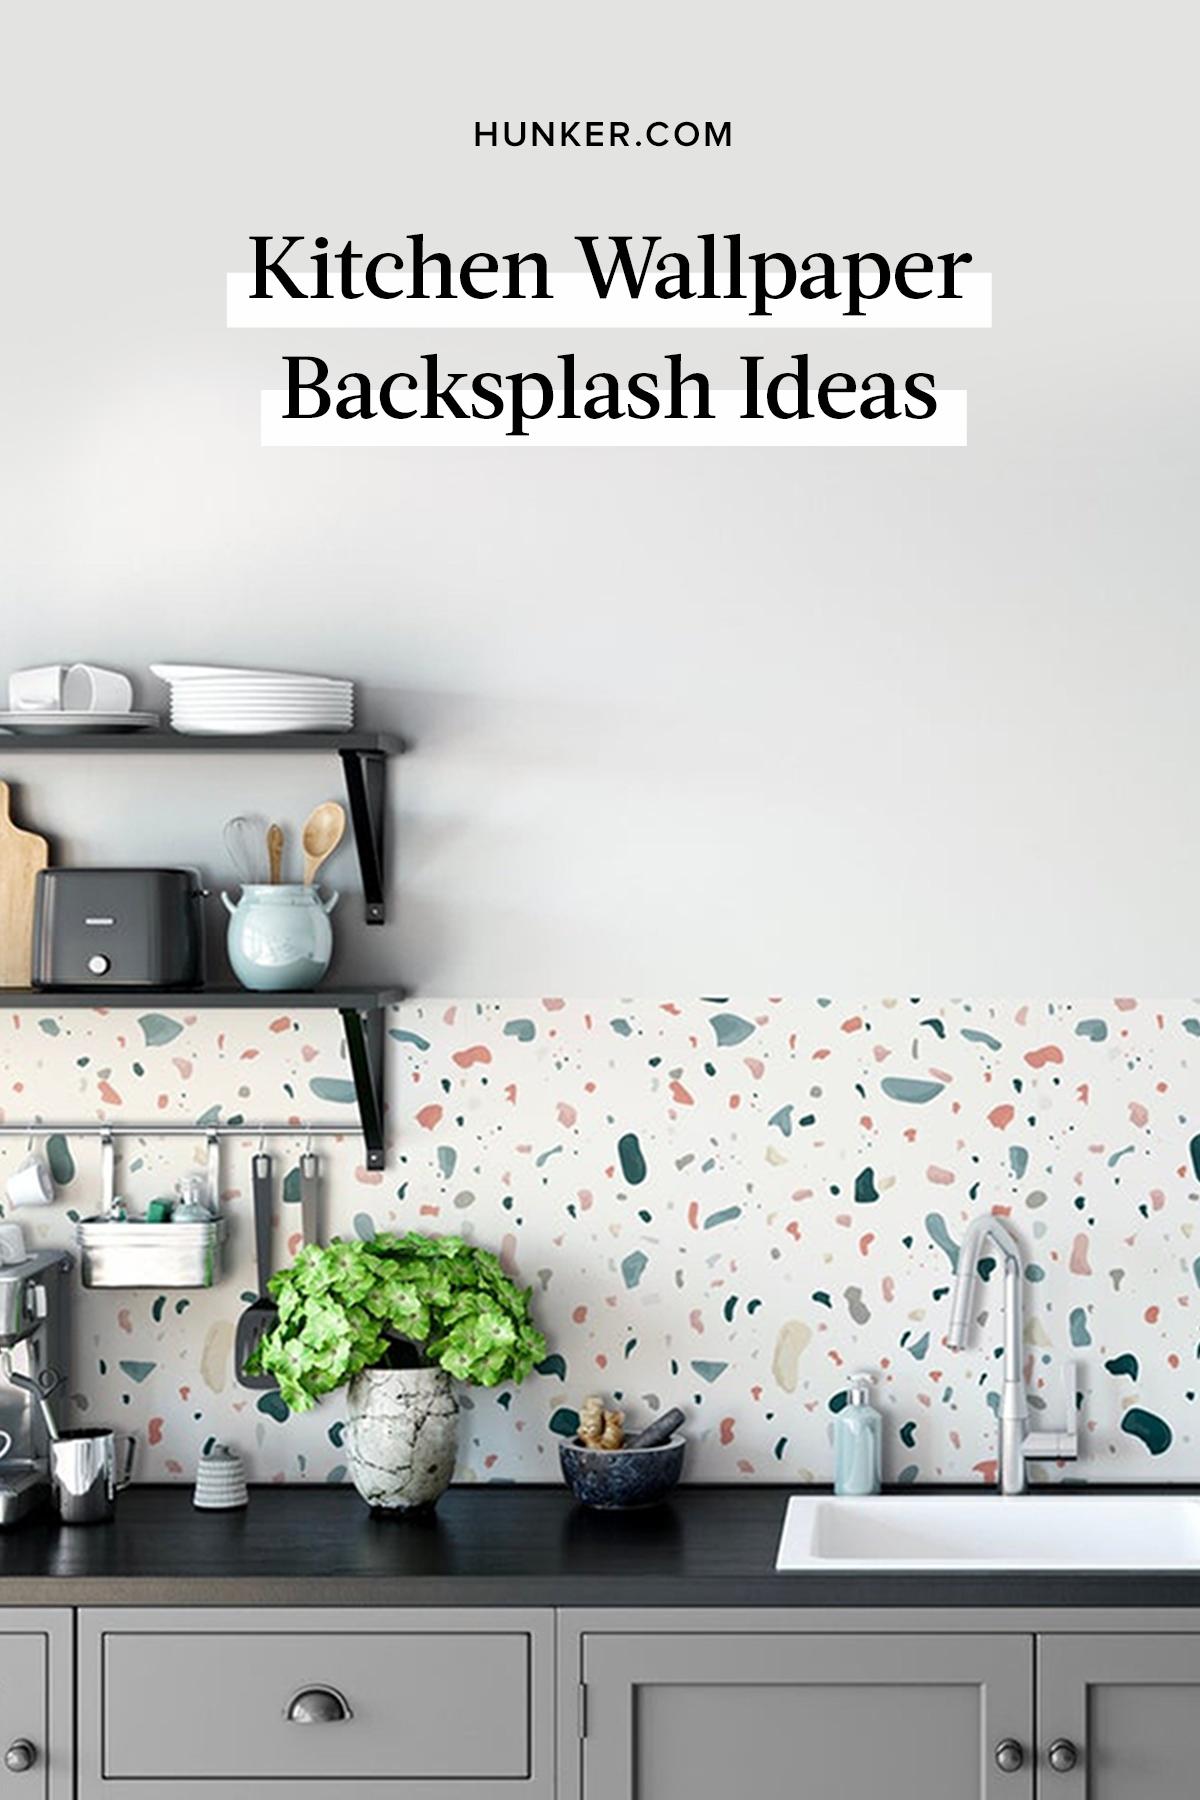 - Wallpaper Backsplash Ideas You Should Definitely Consider For Your